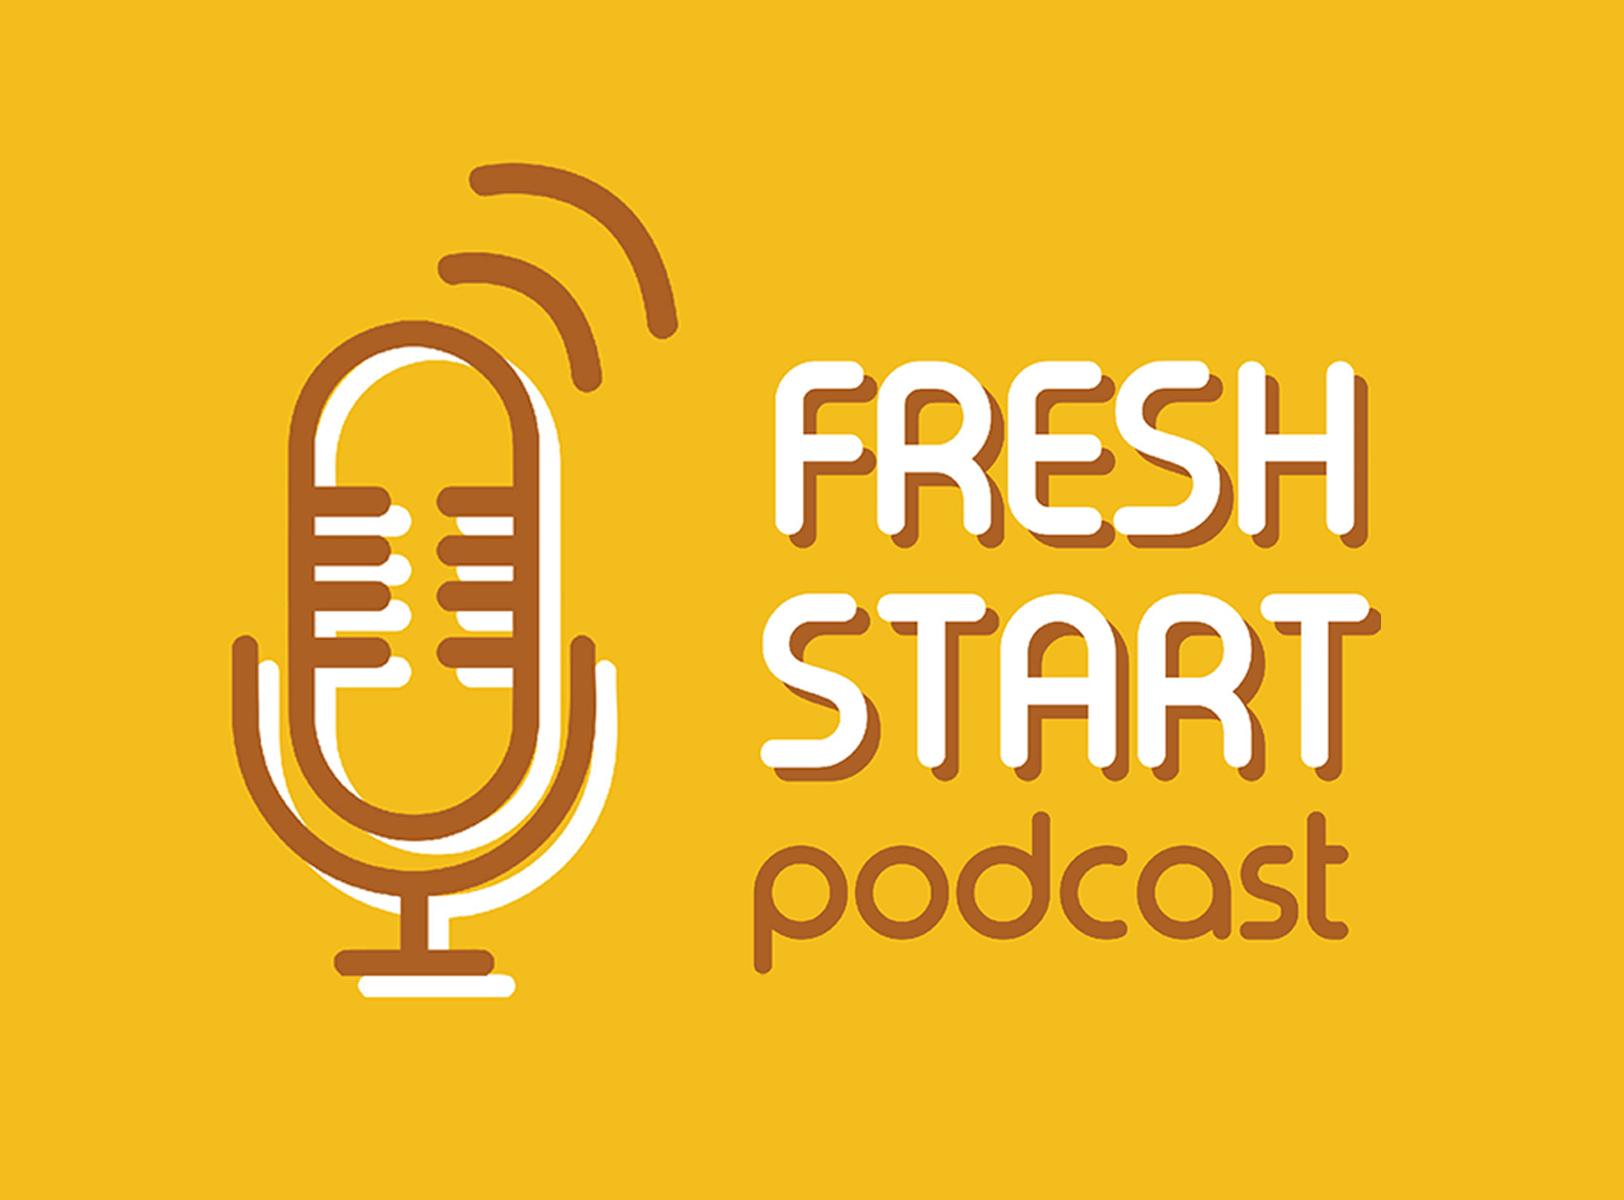 Fresh Start: Podcast News (11/25/2019 Mon.)